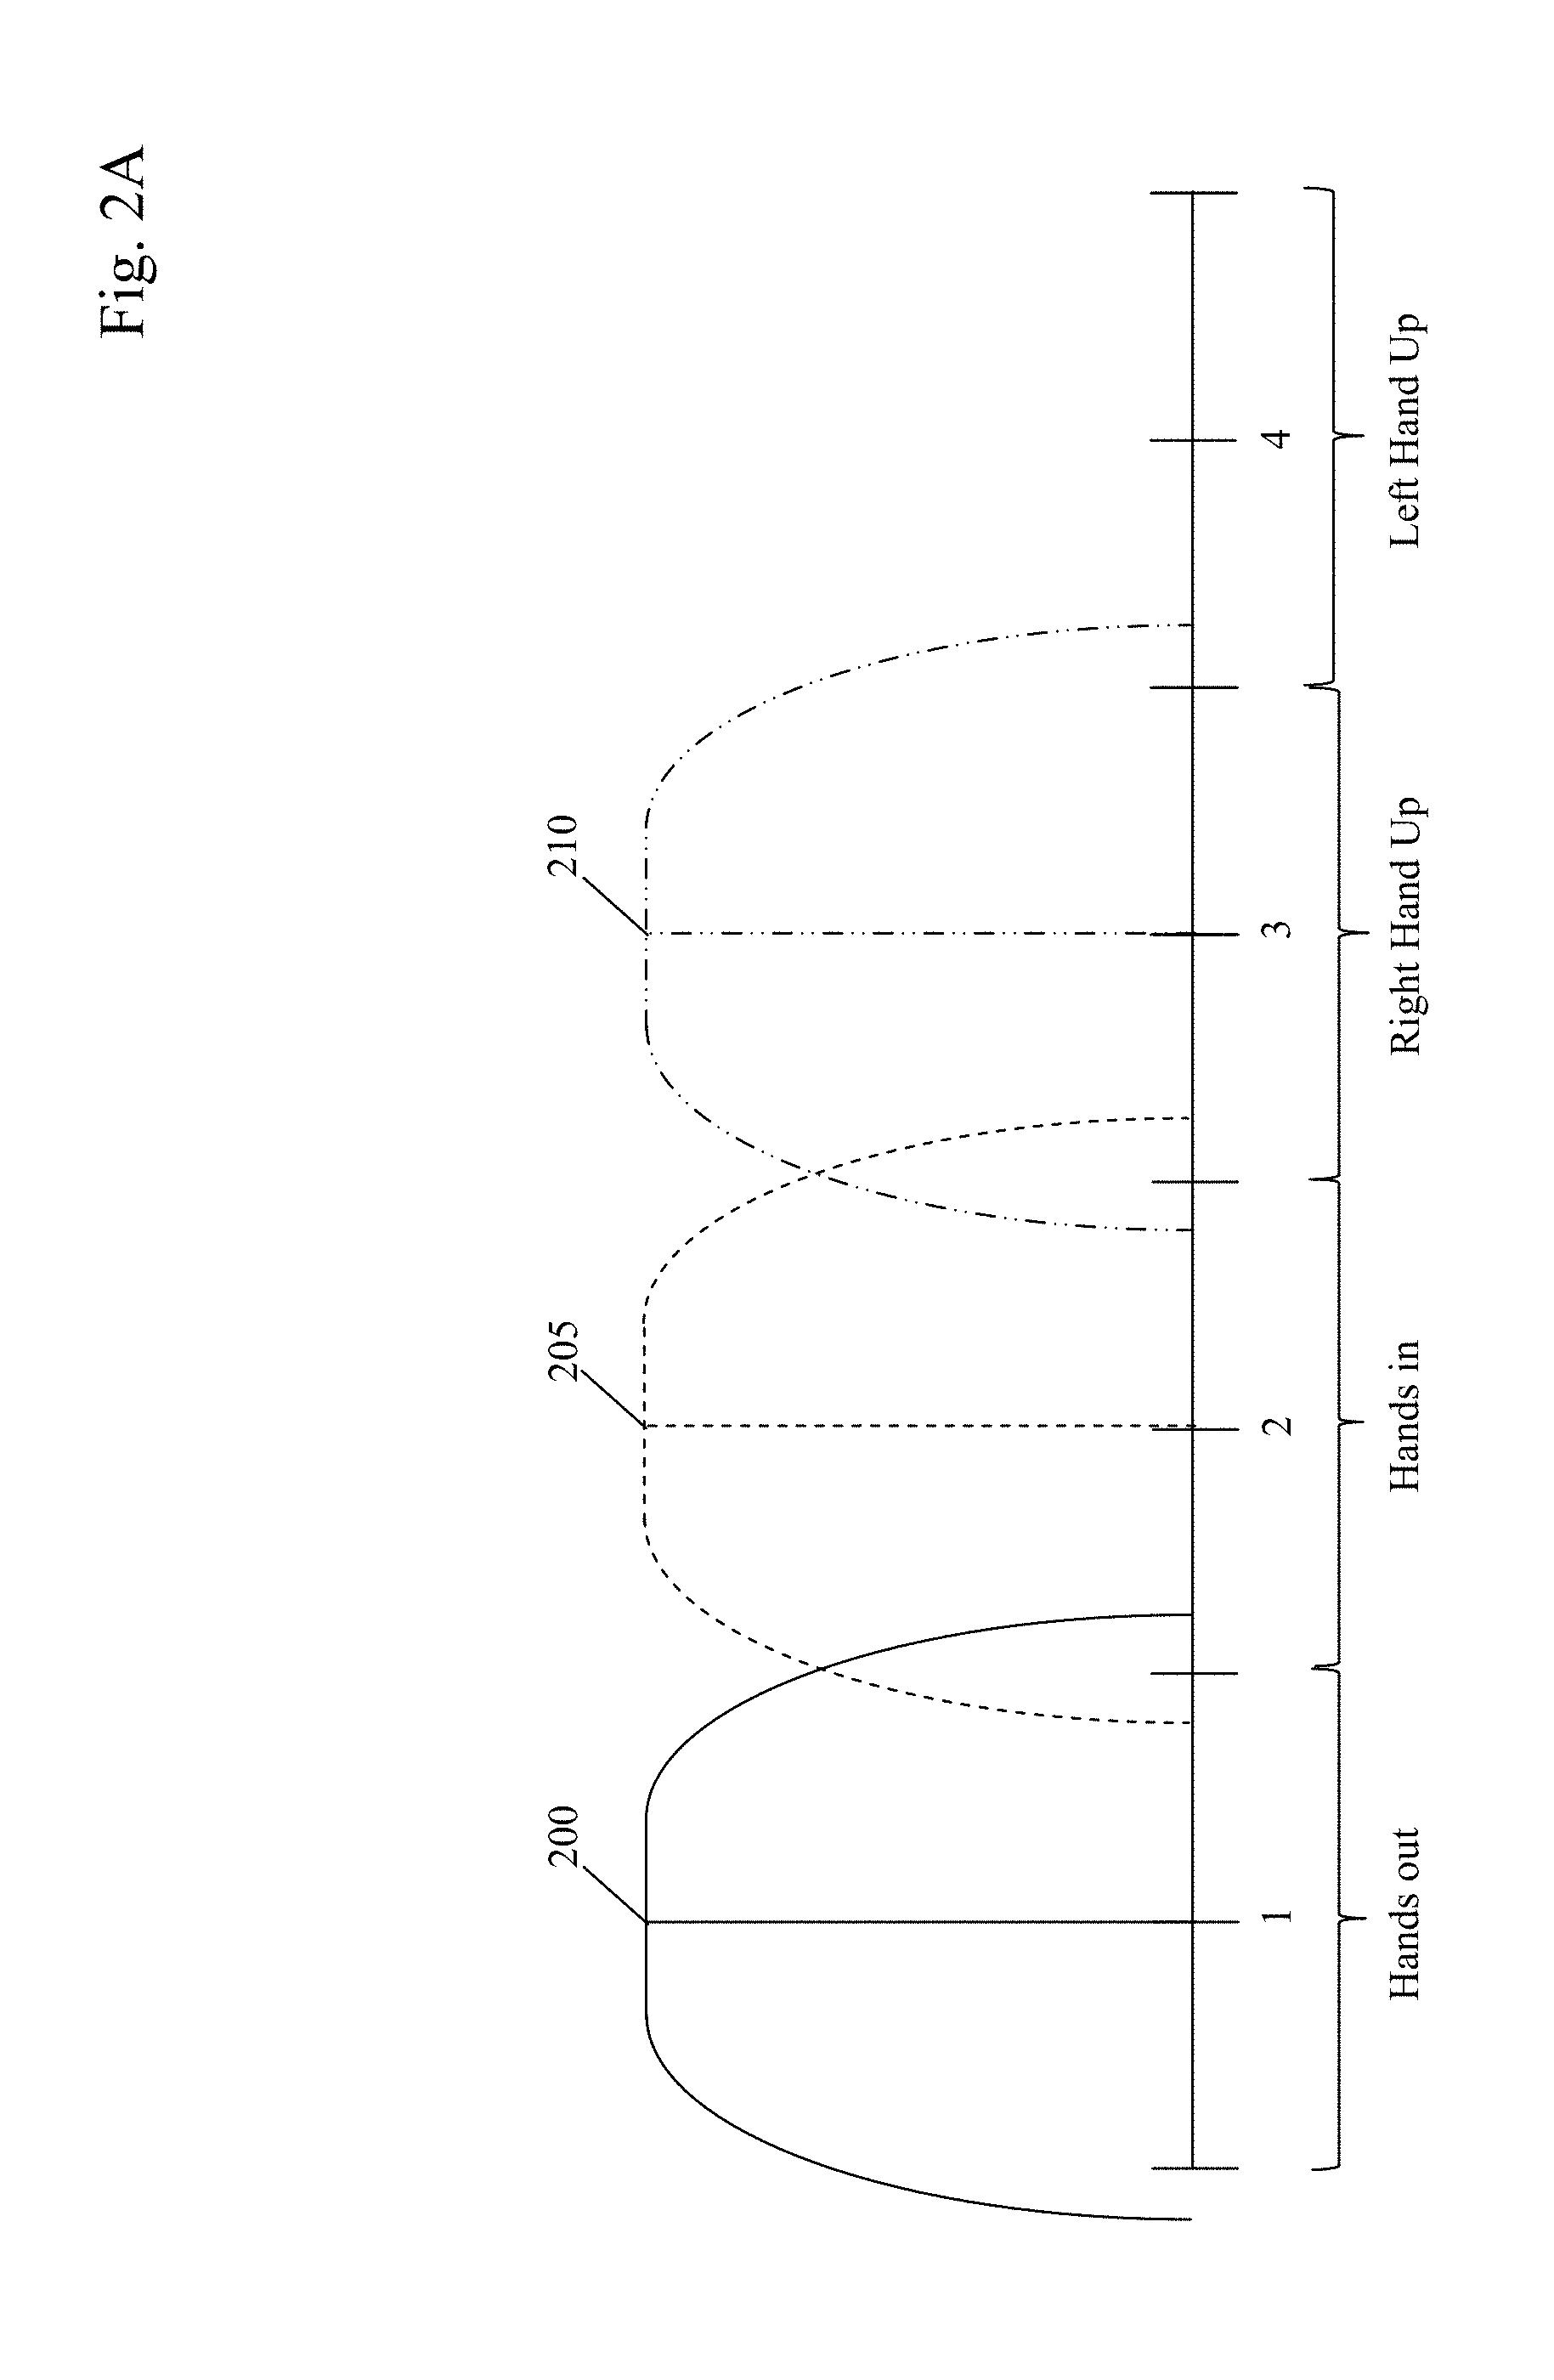 Patent US 9,981,193 B2